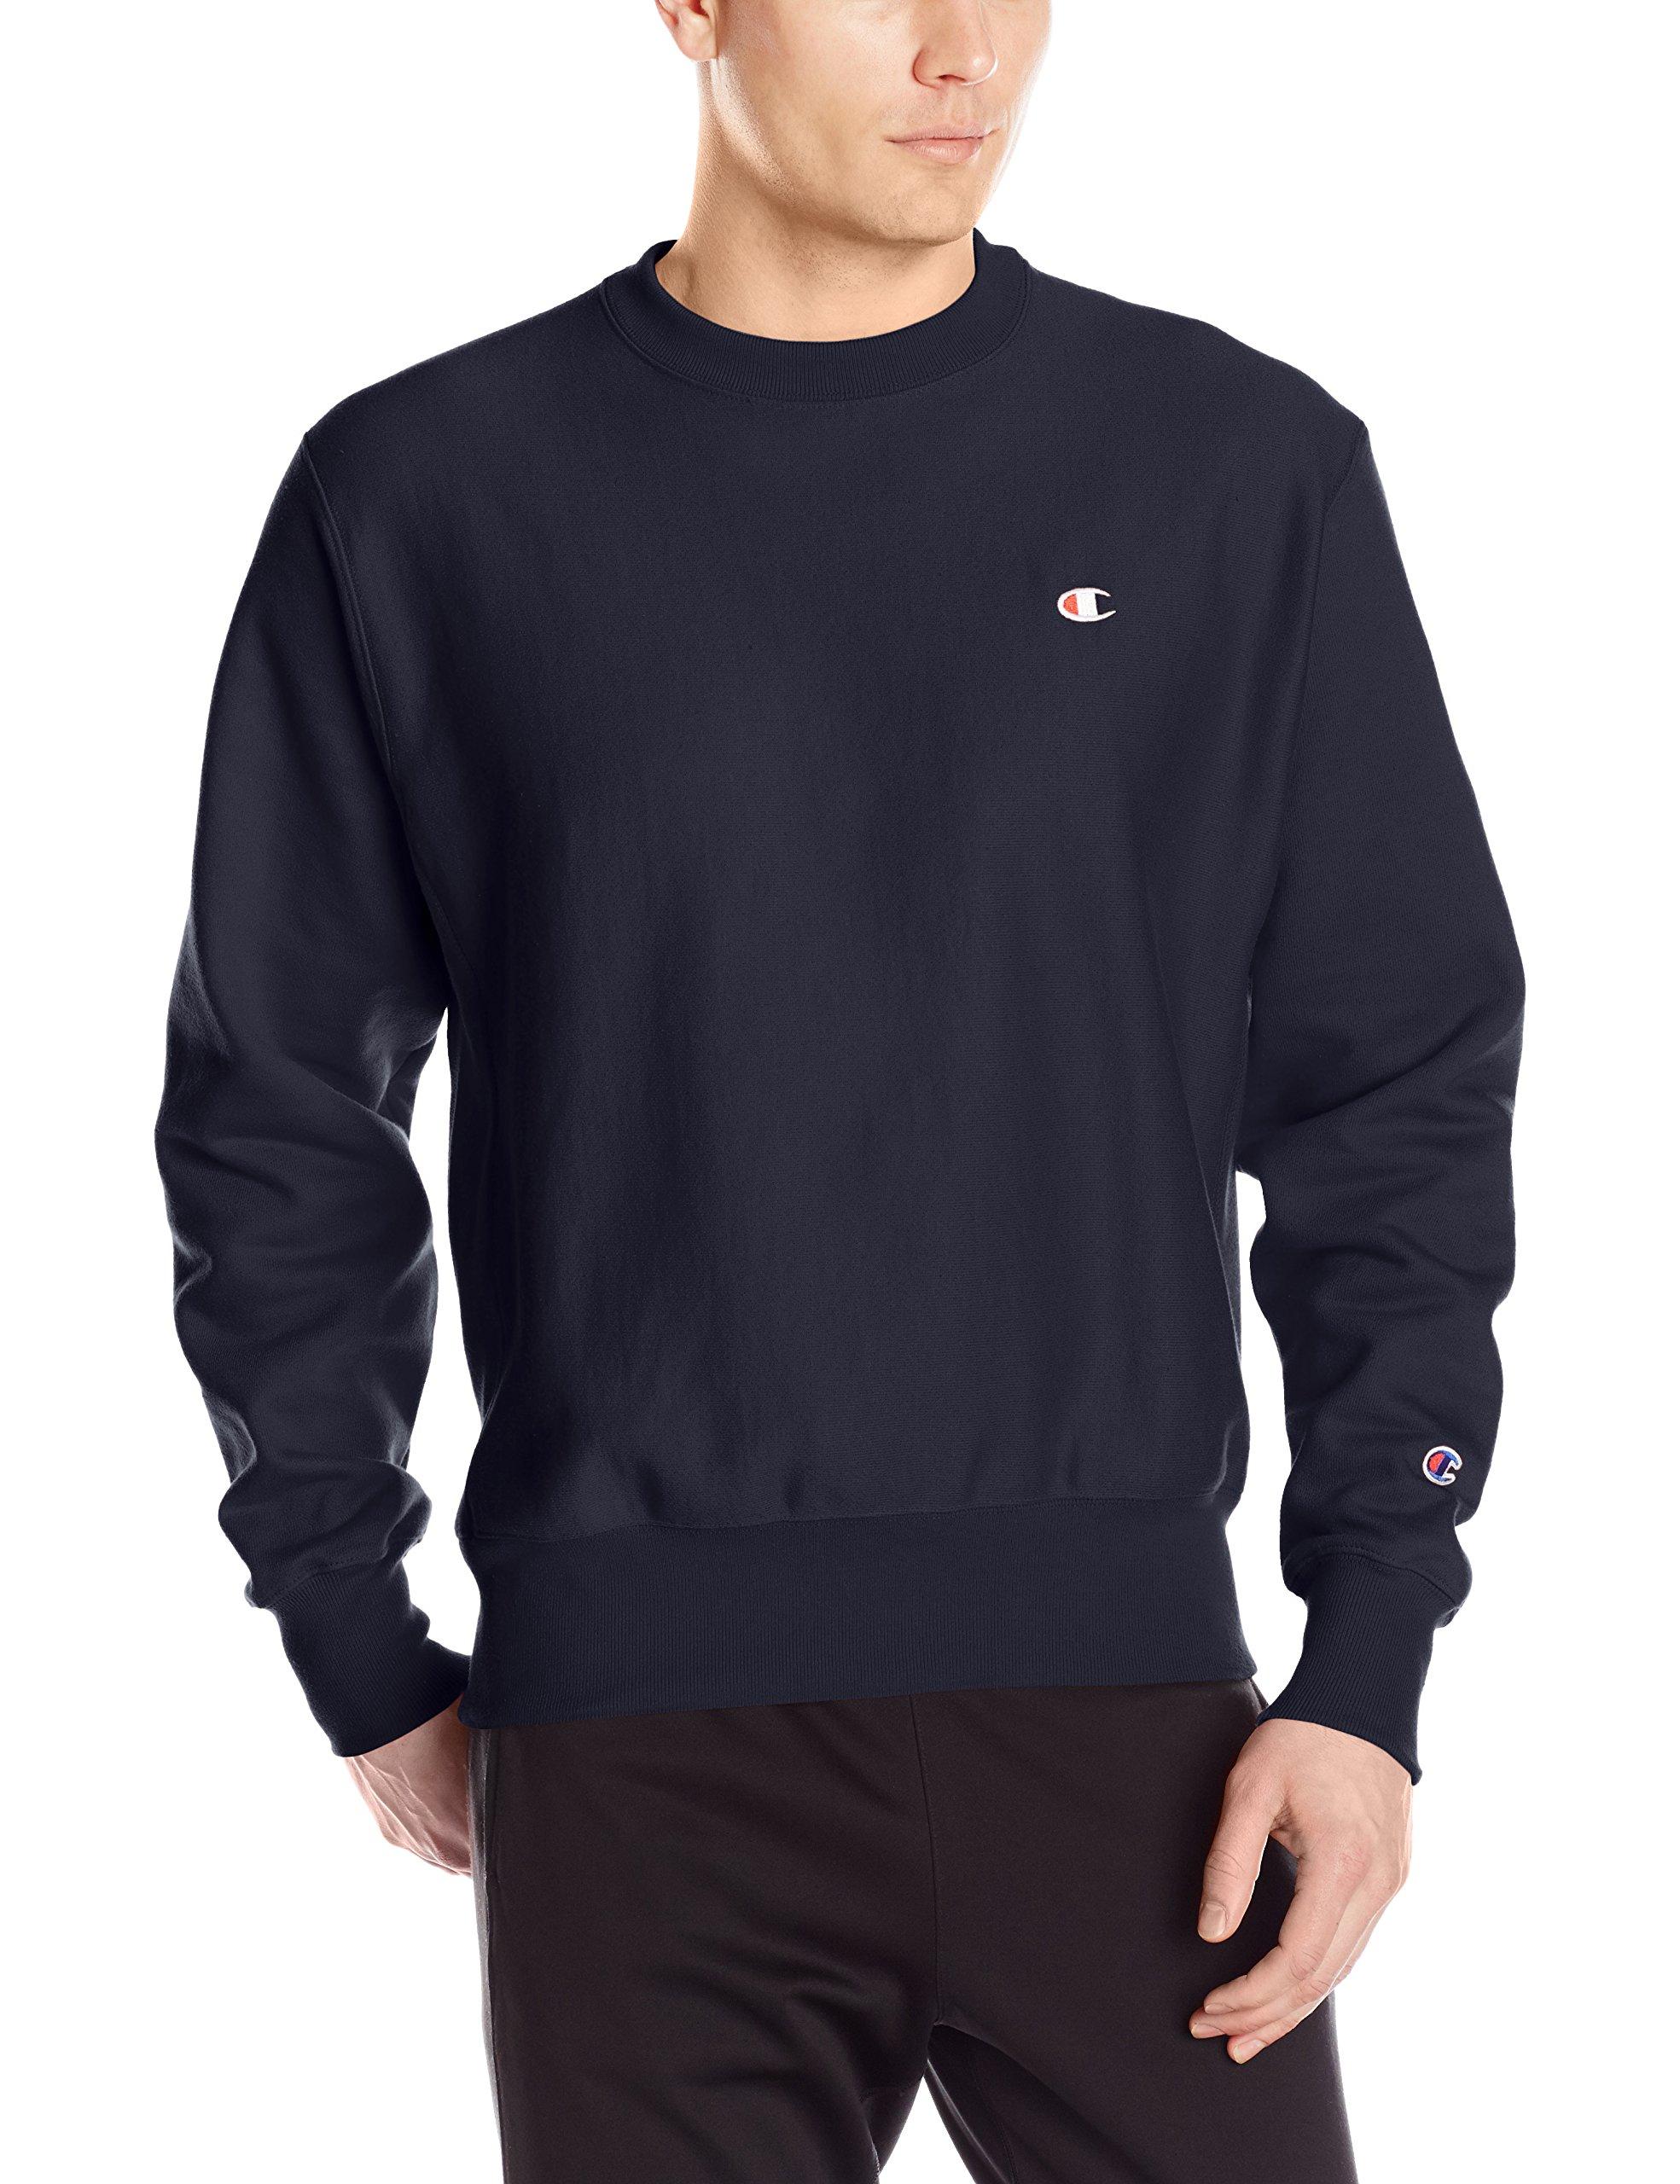 Champion LIFE Men's Reverse Weave Sweatshirt, Navy, Small